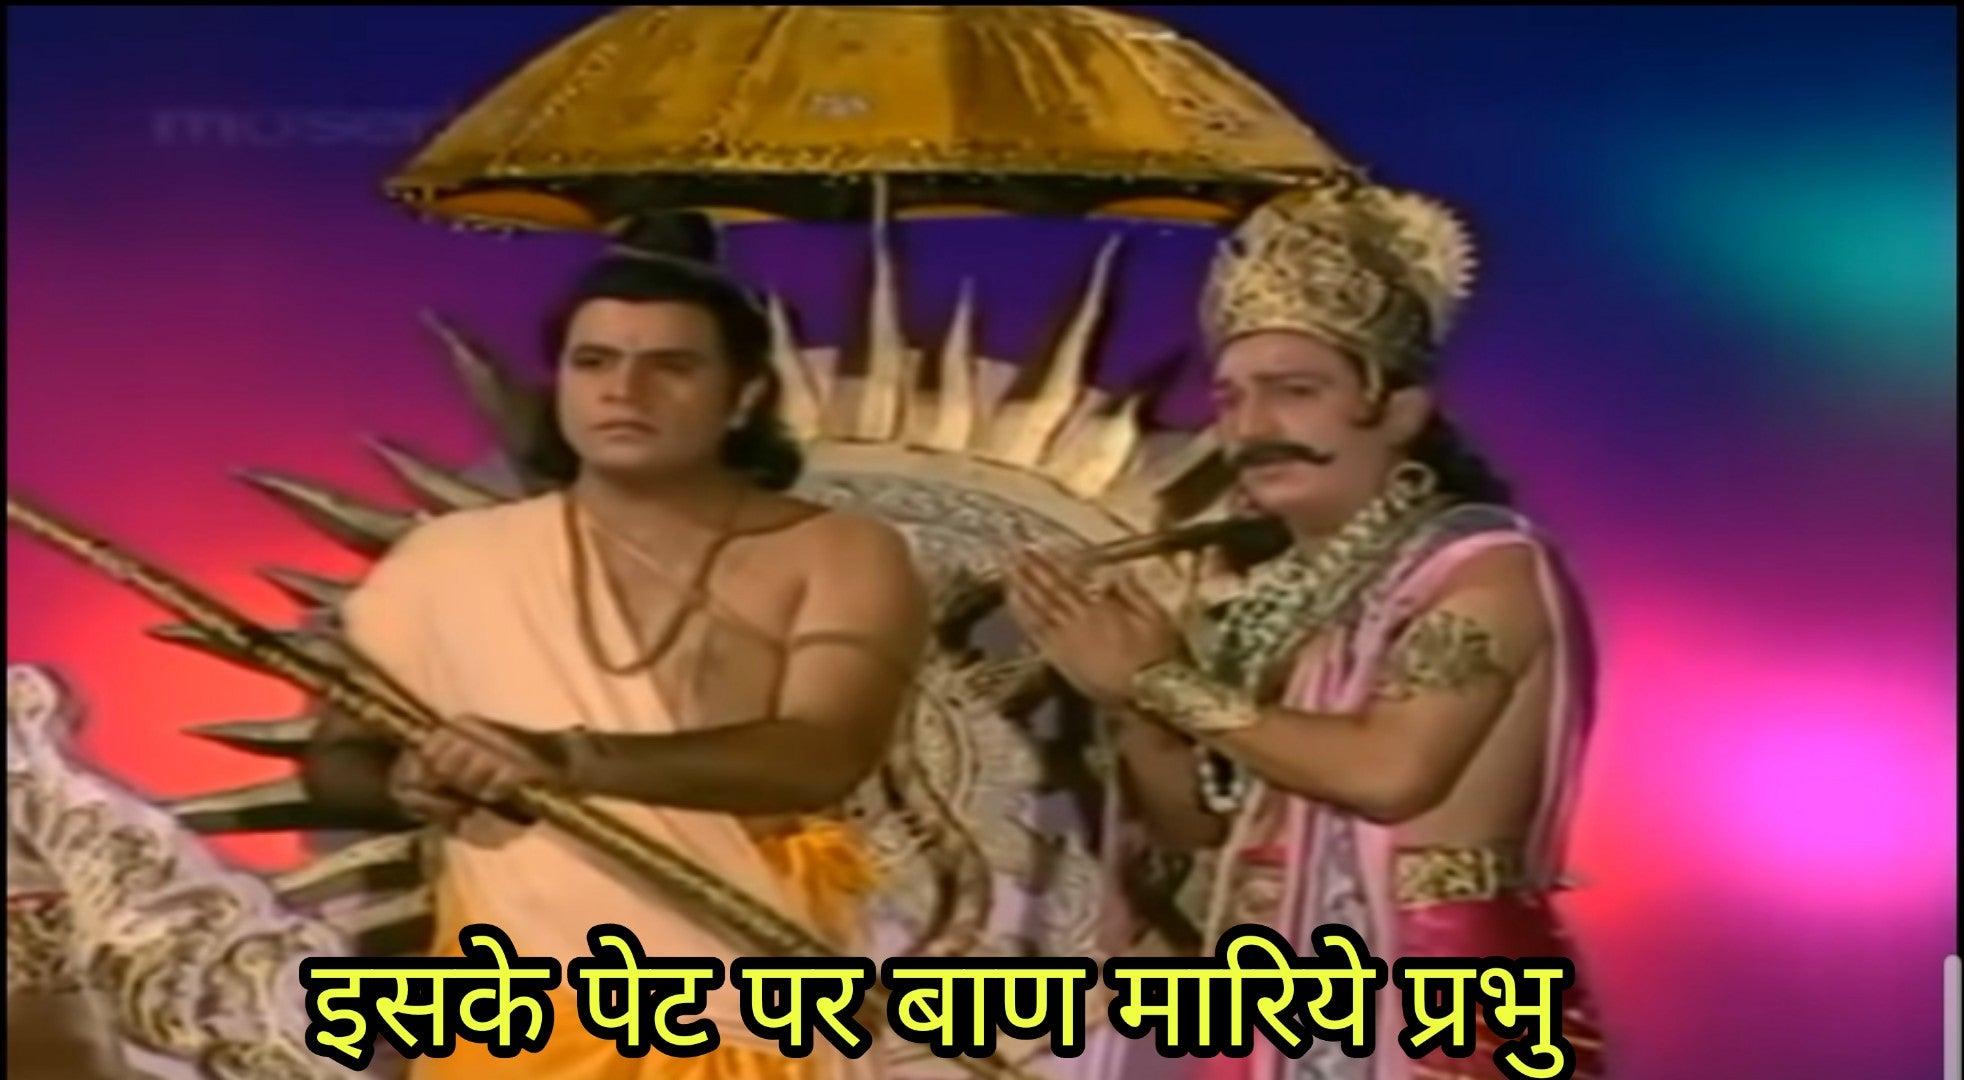 indian meme template